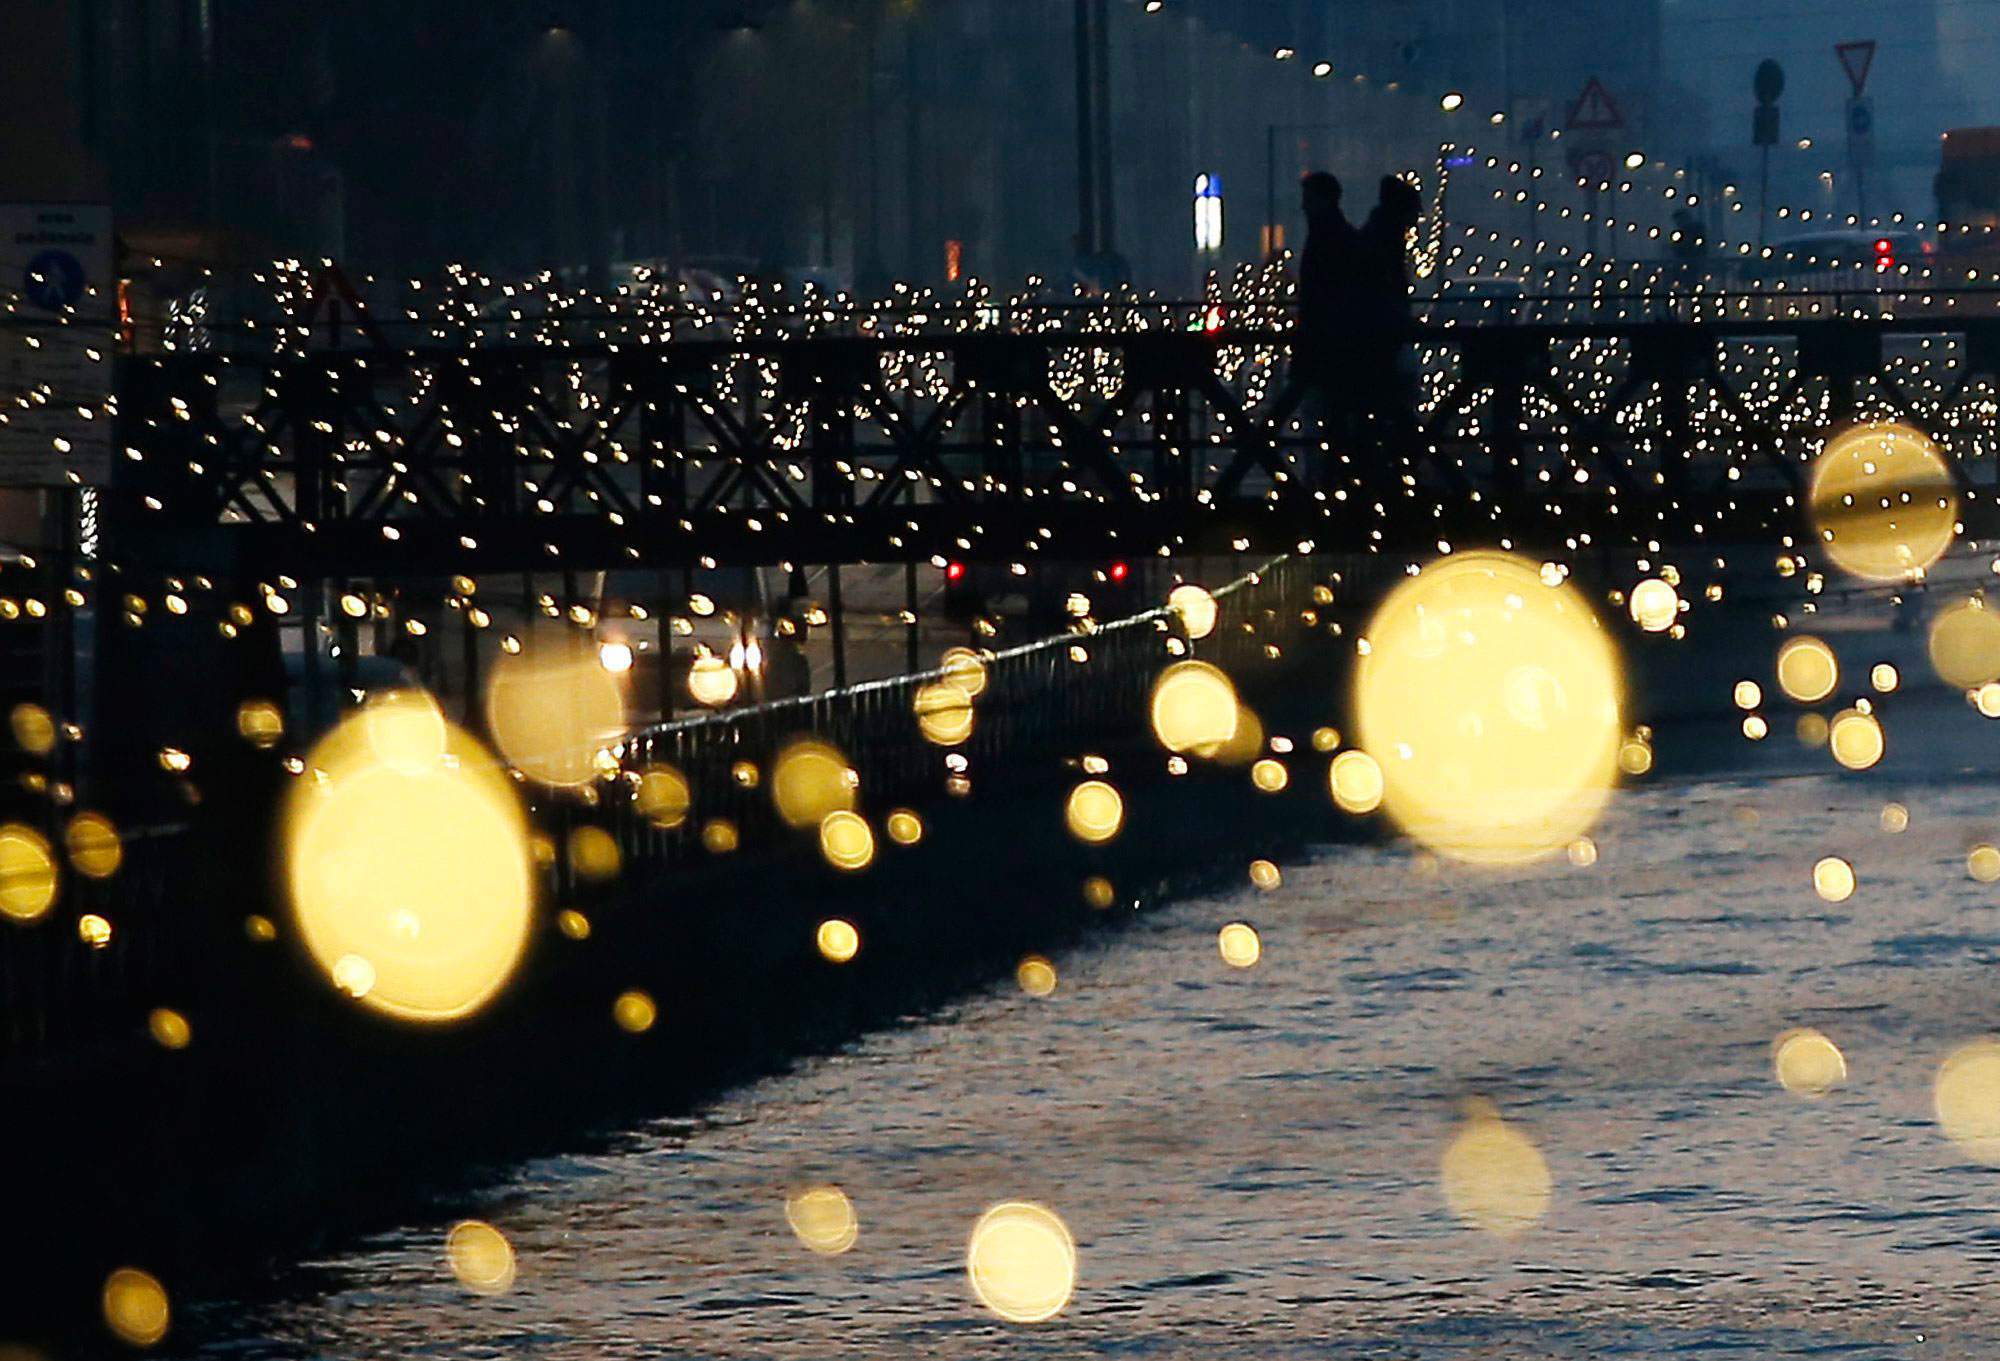 People walk on a bridge as Christmas lights illuminate the Darsena dei Navigli, the neighborhood named for the canals that run through this area of Milan, Italy, on Dec. 16, 2015. THE ASSOCIATED PRESS/Antonio Calanni.